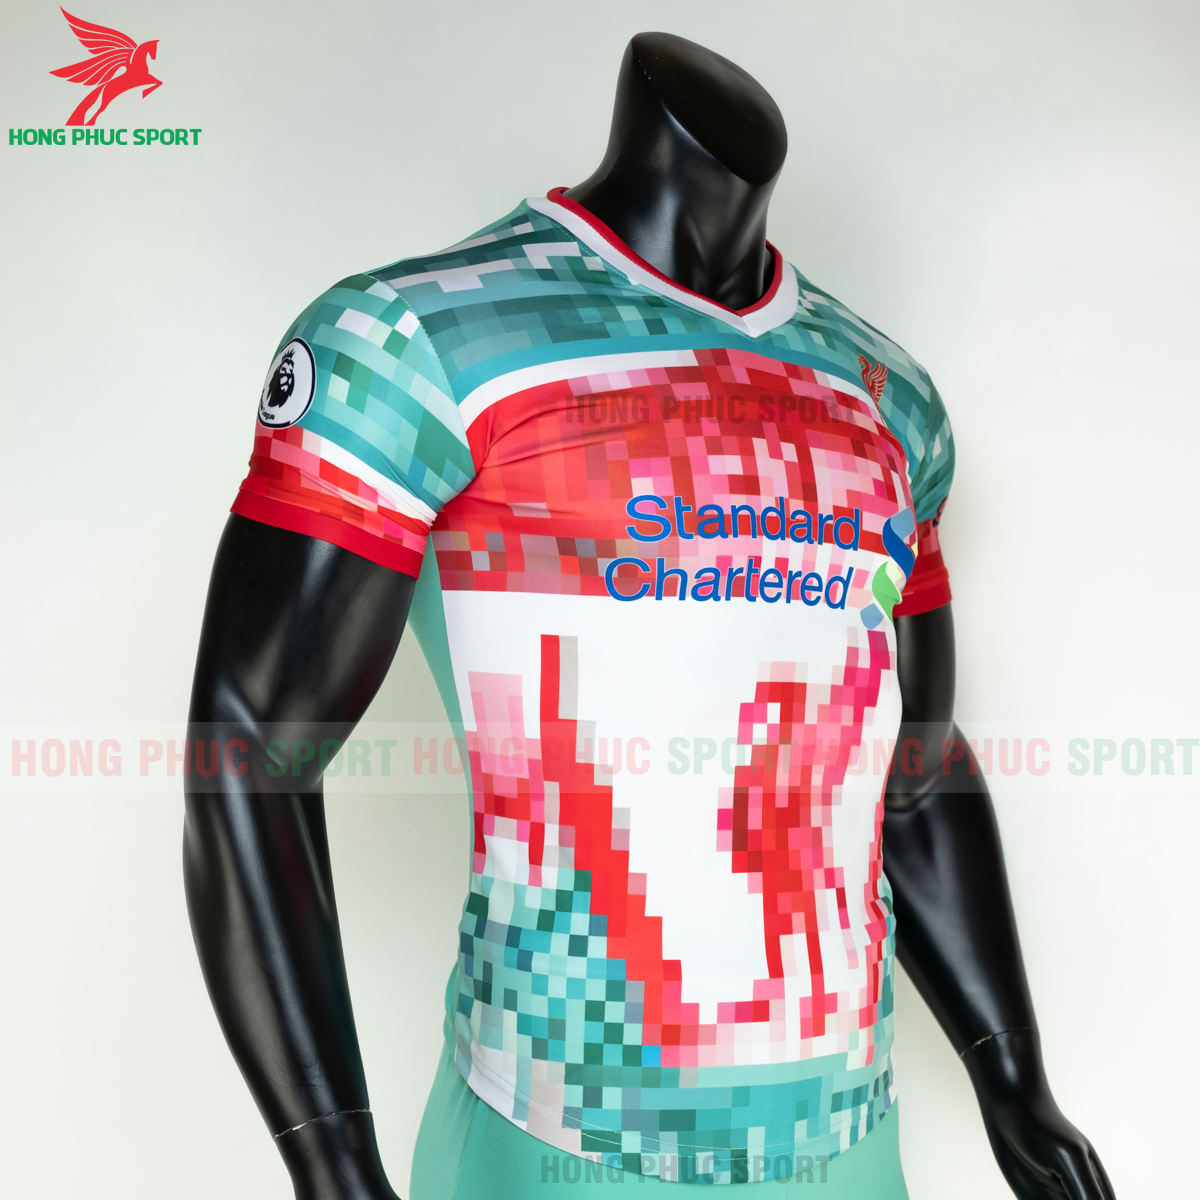 https://cdn.hongphucsport.com/unsafe/s4.shopbay.vn/files/285/ao-da-bong-liverpool-2020-2021-phien-ban-fan-5-5fe1ad12eed7f.png